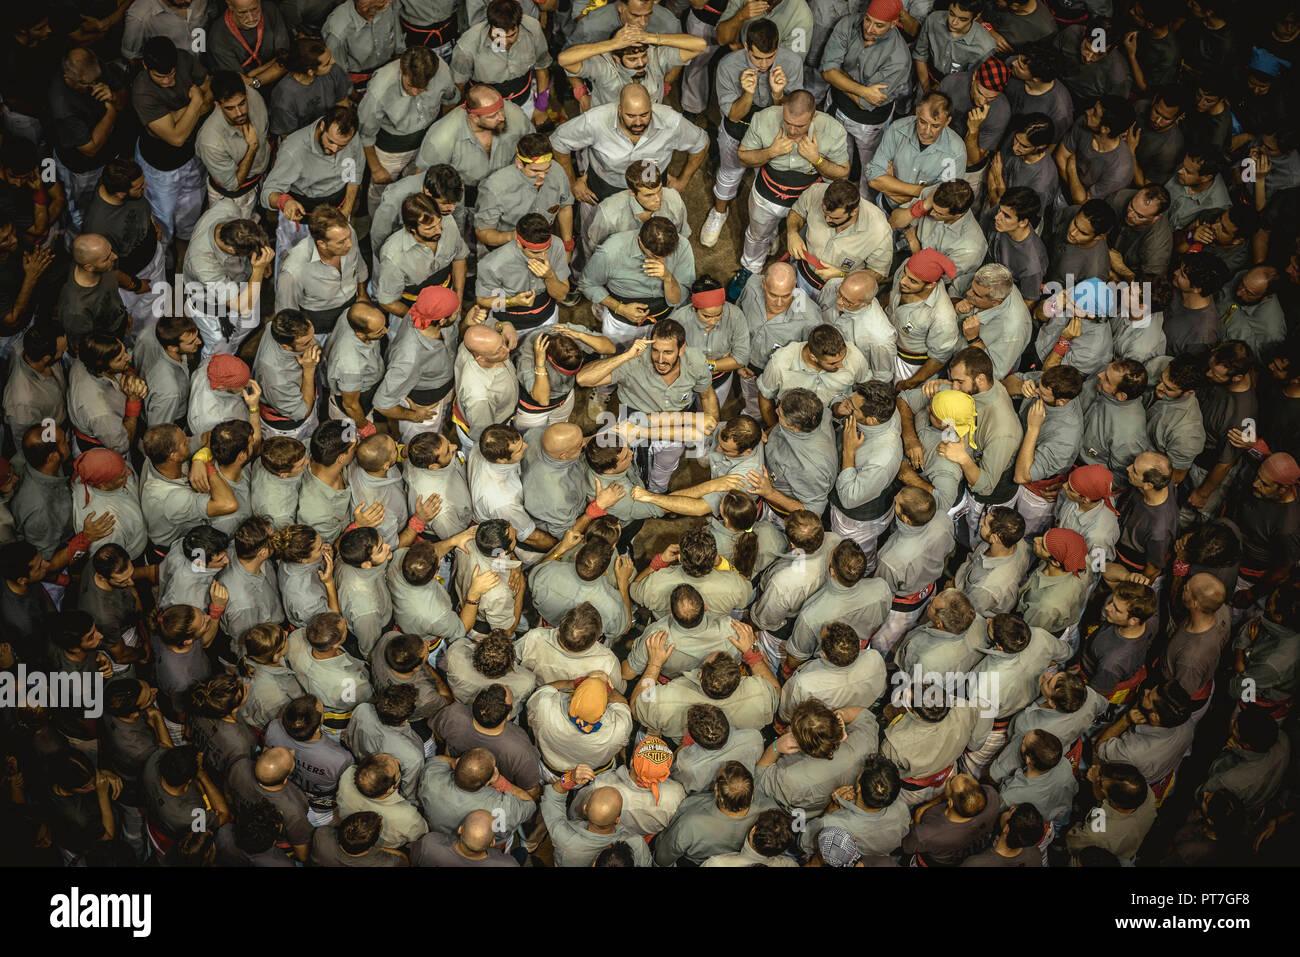 Barcelona, Spain  7th Oct 2018  The 'Castellers de Sants' gather to